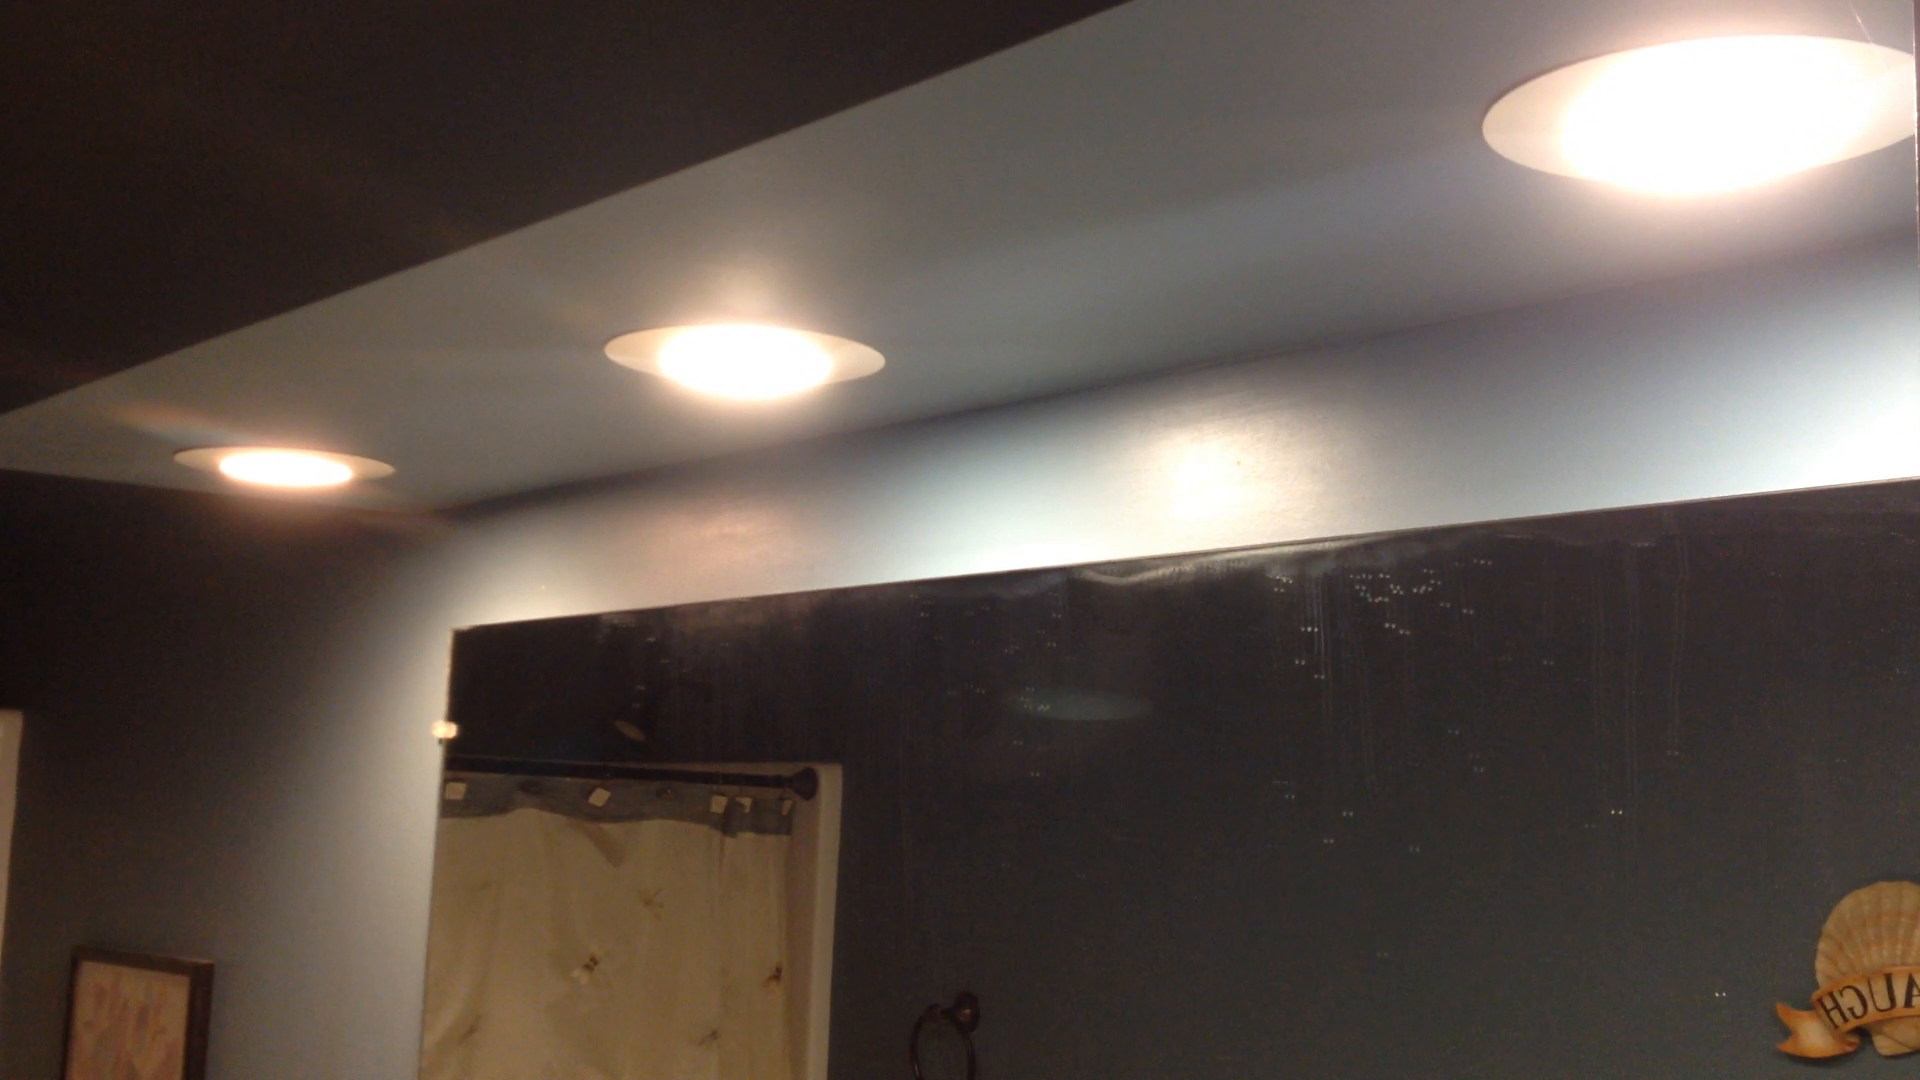 SleekLighting BR30 LED 8.5 WattDimmable Wide Flood Light Bulb UL Approved 3000K 850 Lumens E26 Medium Base Warm White 18319 65 Watt Equivalent 110/° PACK OF 4